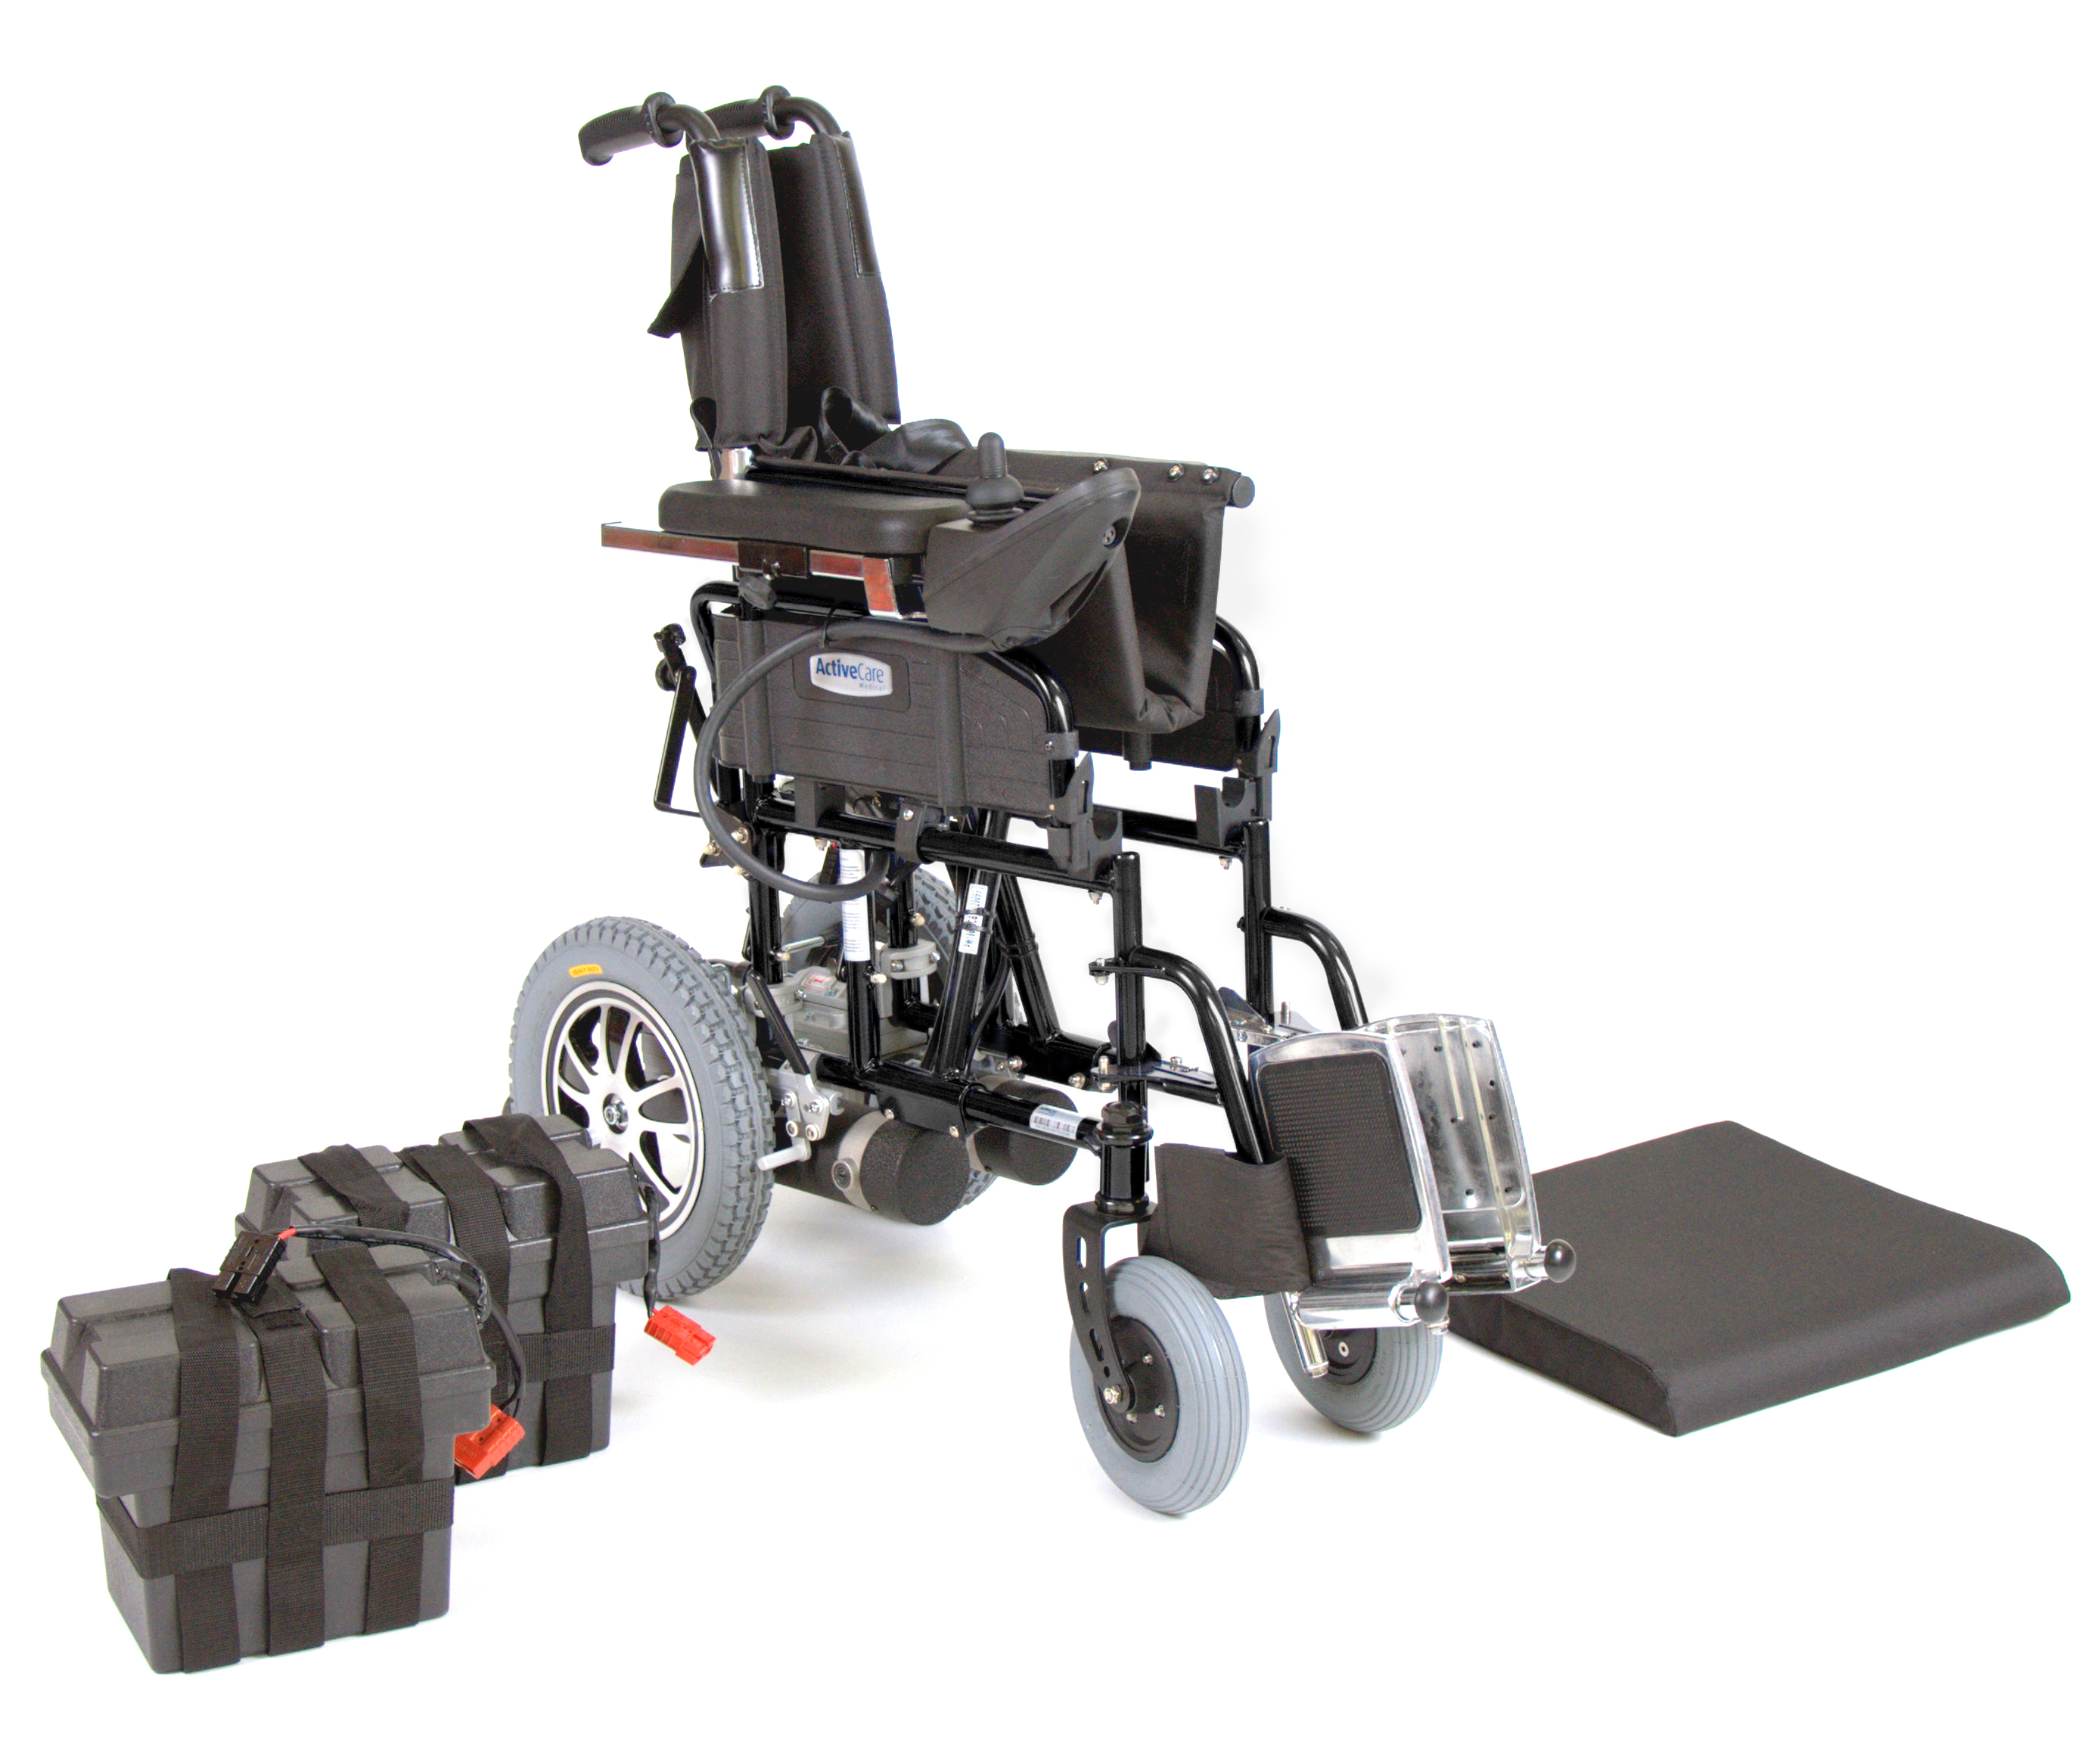 wildcat-folding-power-wheelchair-wildcat18r-drive-medical-2.jpg